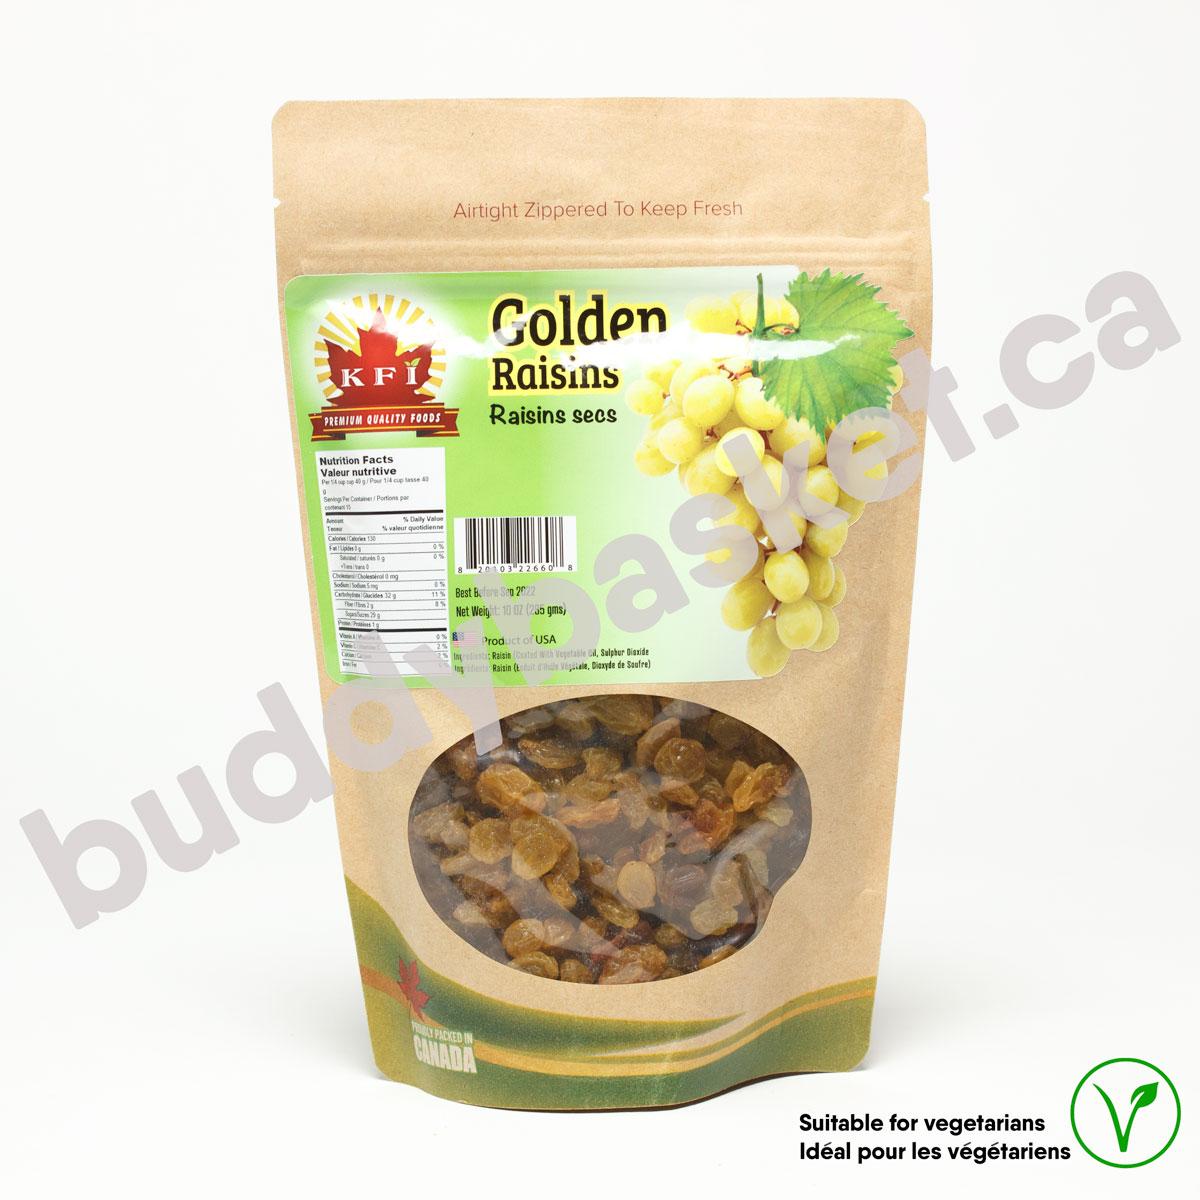 KFI Golden Raisins 285g